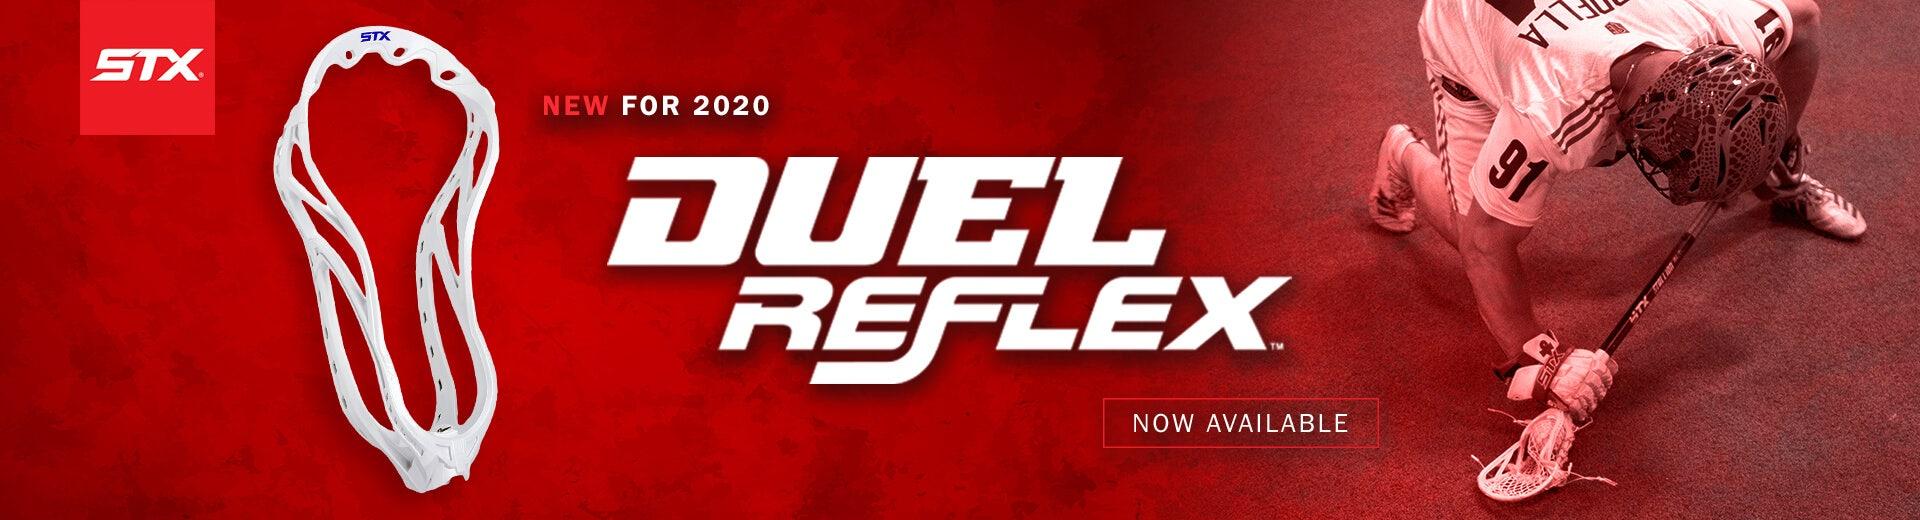 STX Duel Reflex - DESKTOP